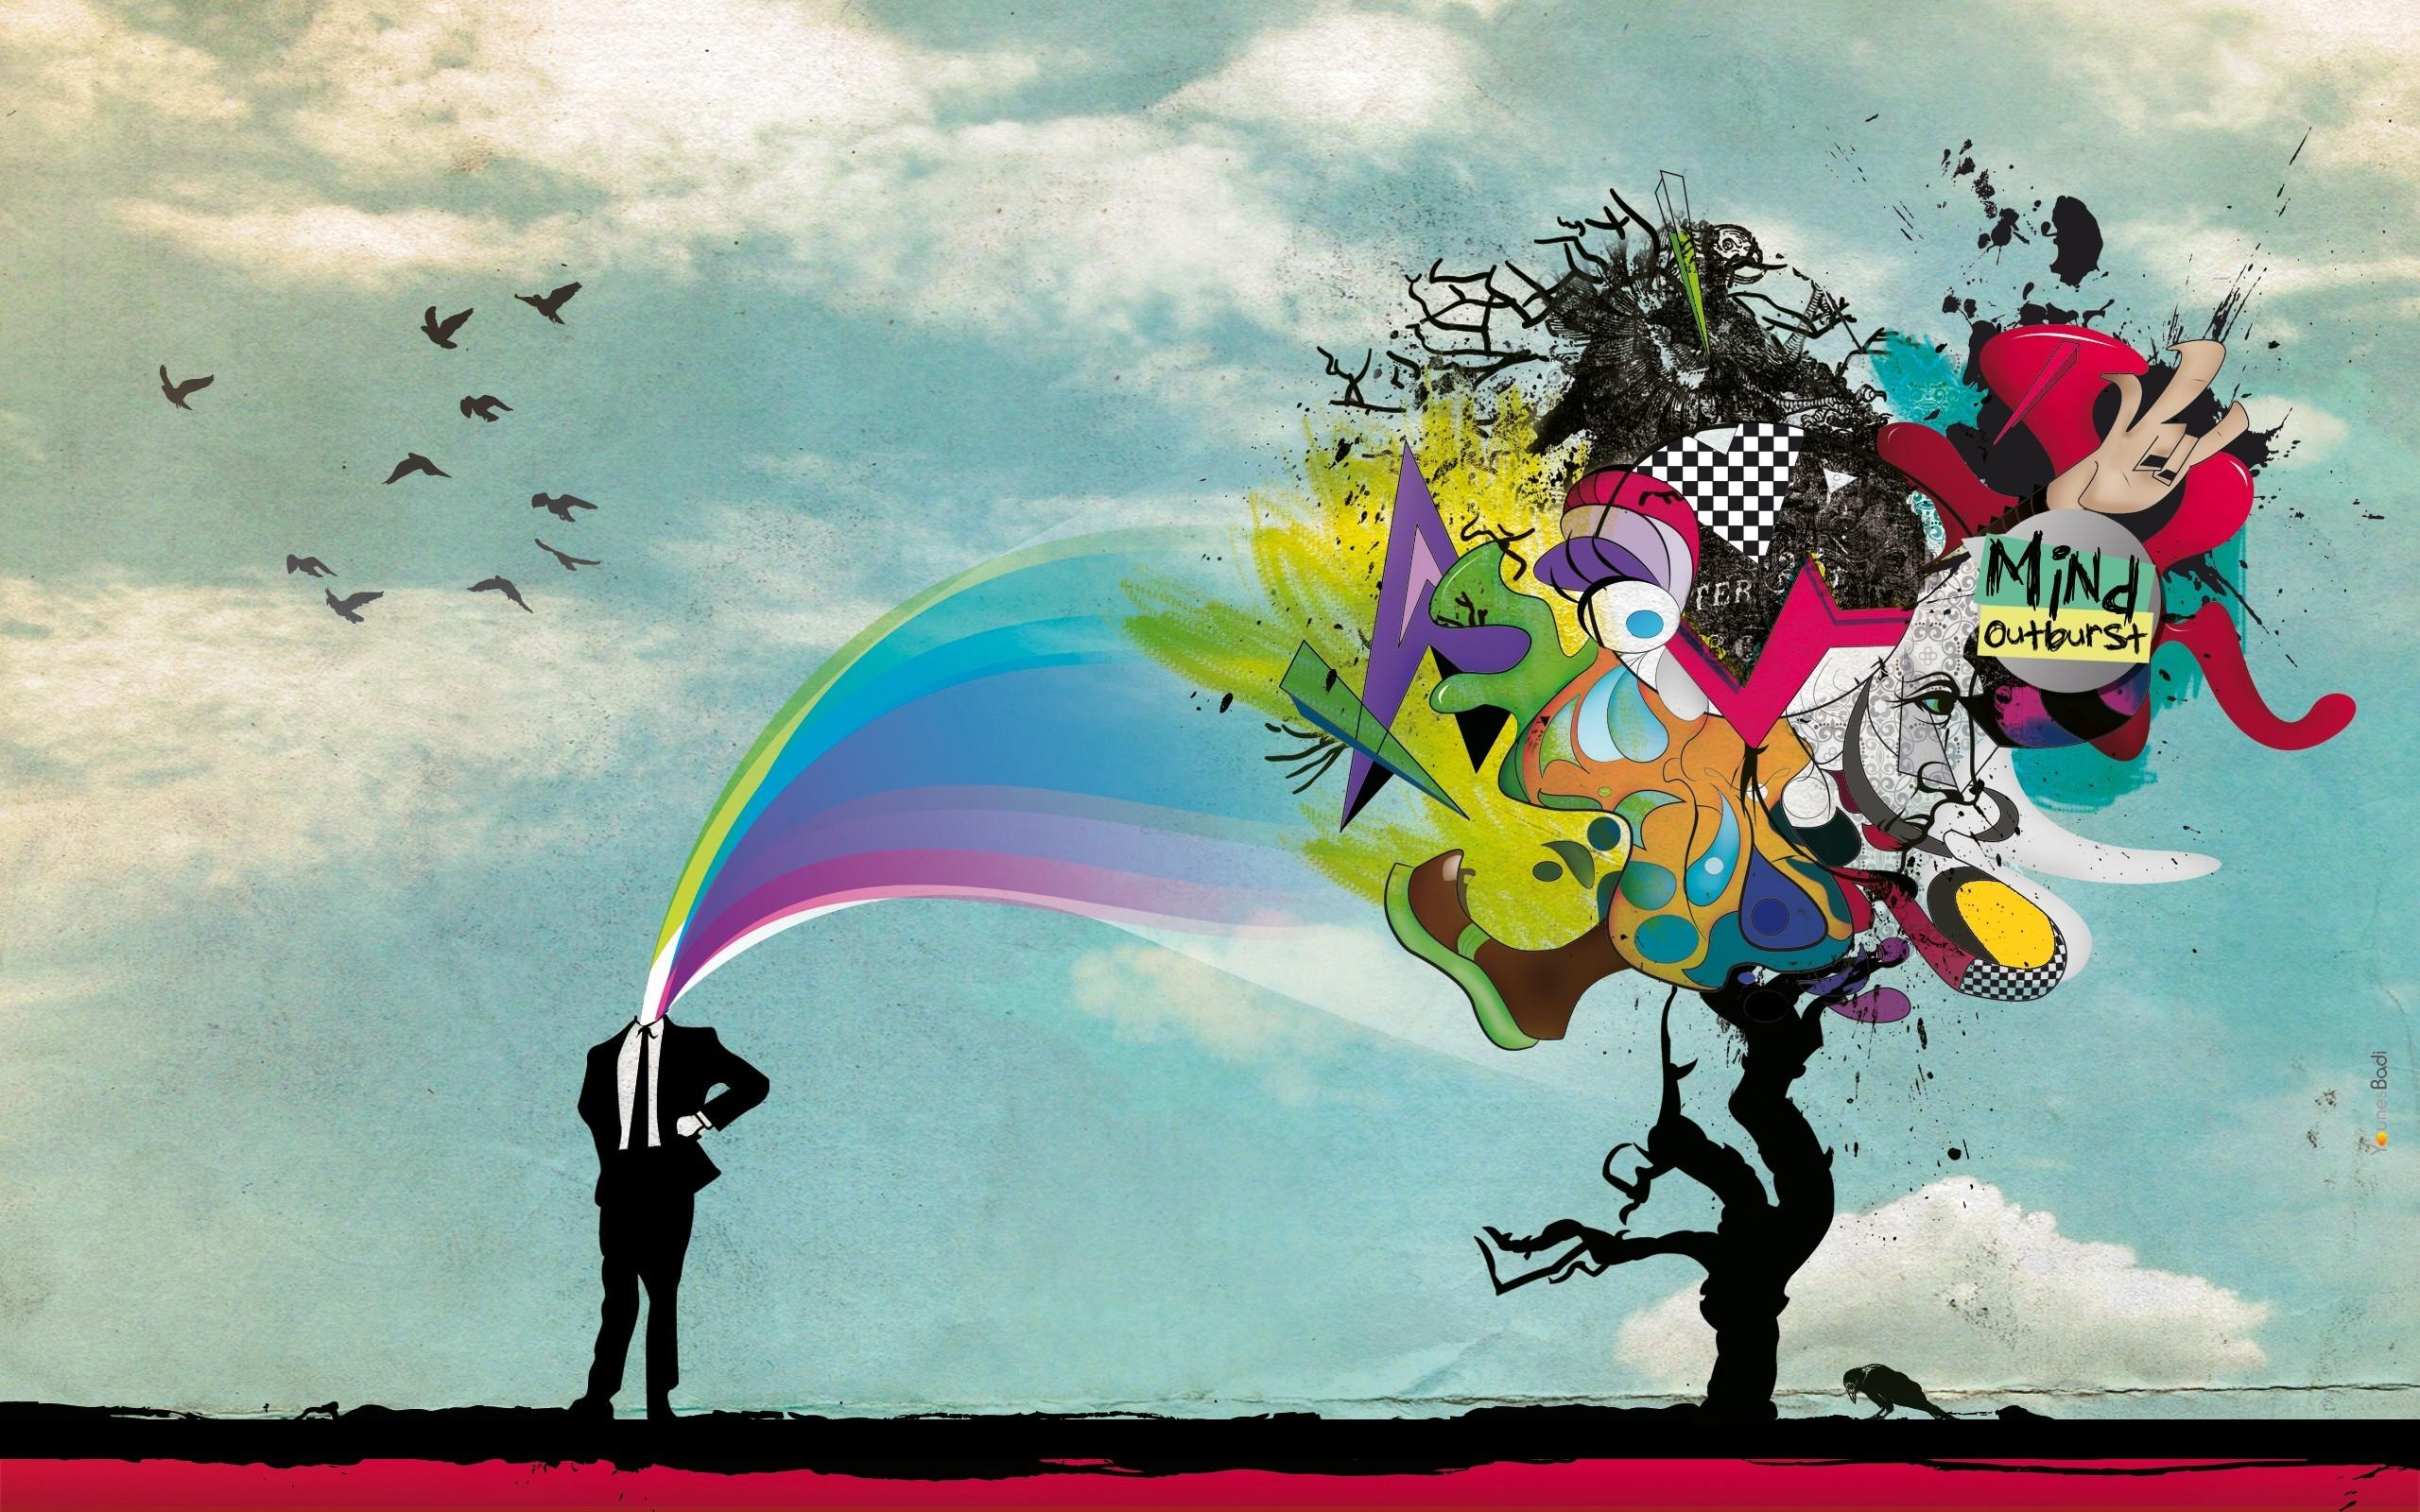 http://www.zastavki.com/pictures/2560x1600/2009/Creative_Wallpaper_Box_thinking_018539_.jpg